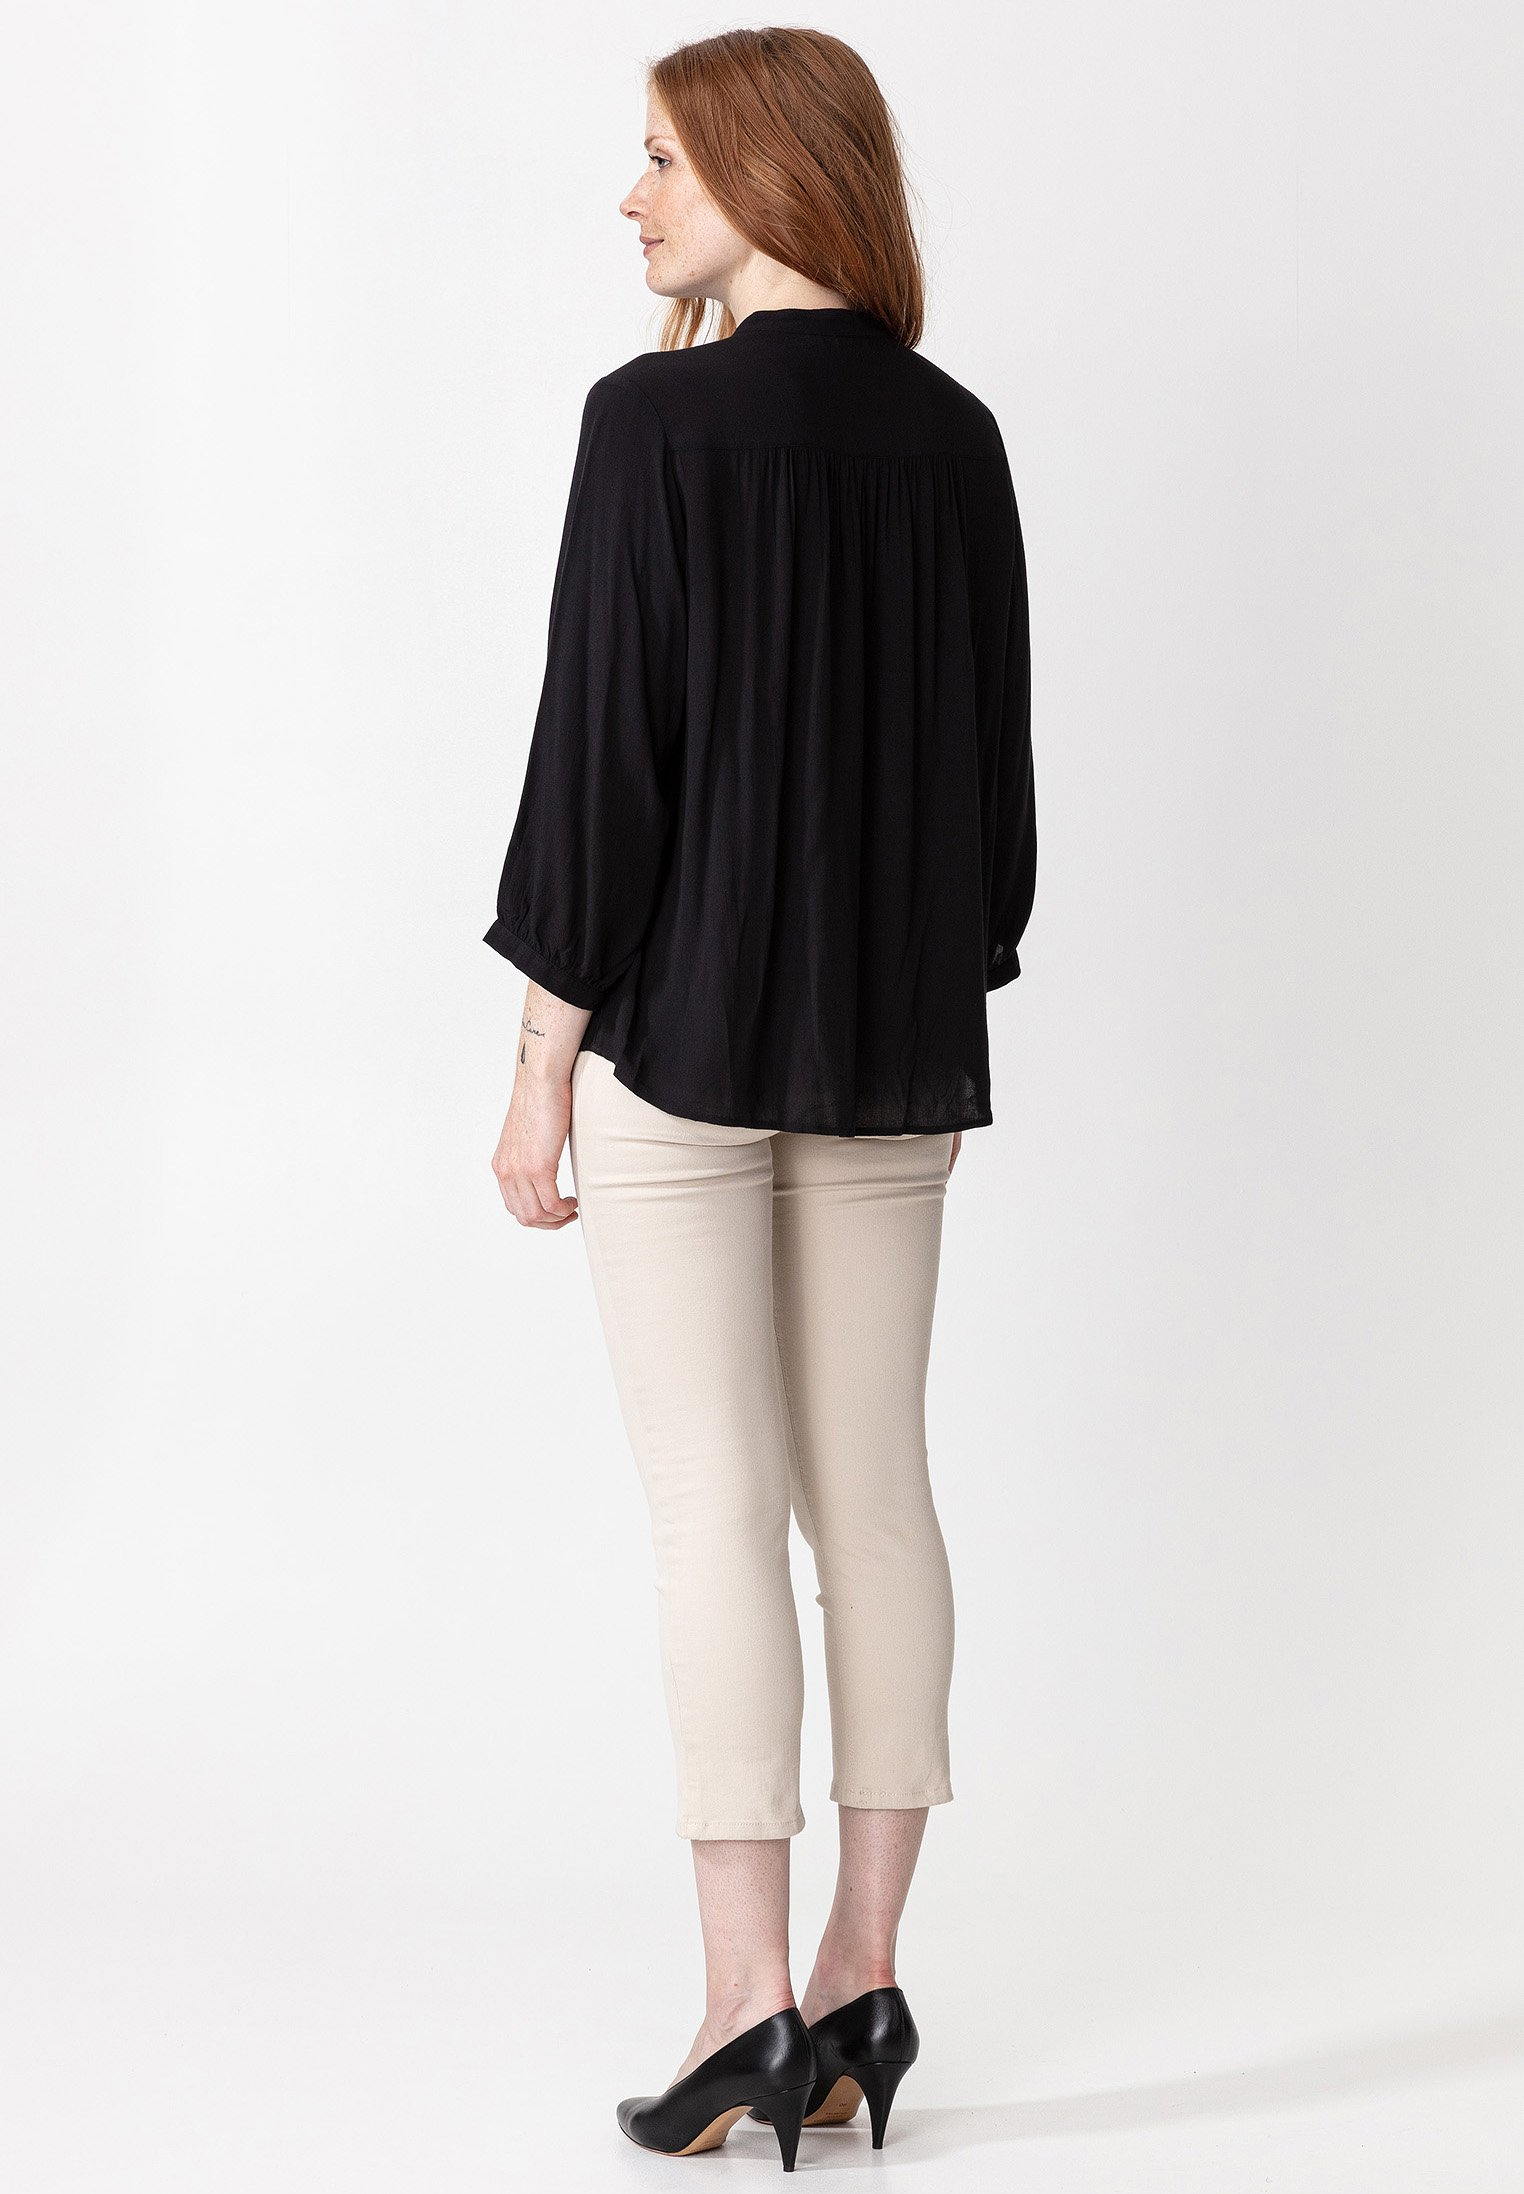 Indiska RIVERA - Overhemdblouse - black - Dameskleding AAA-kwaliteit